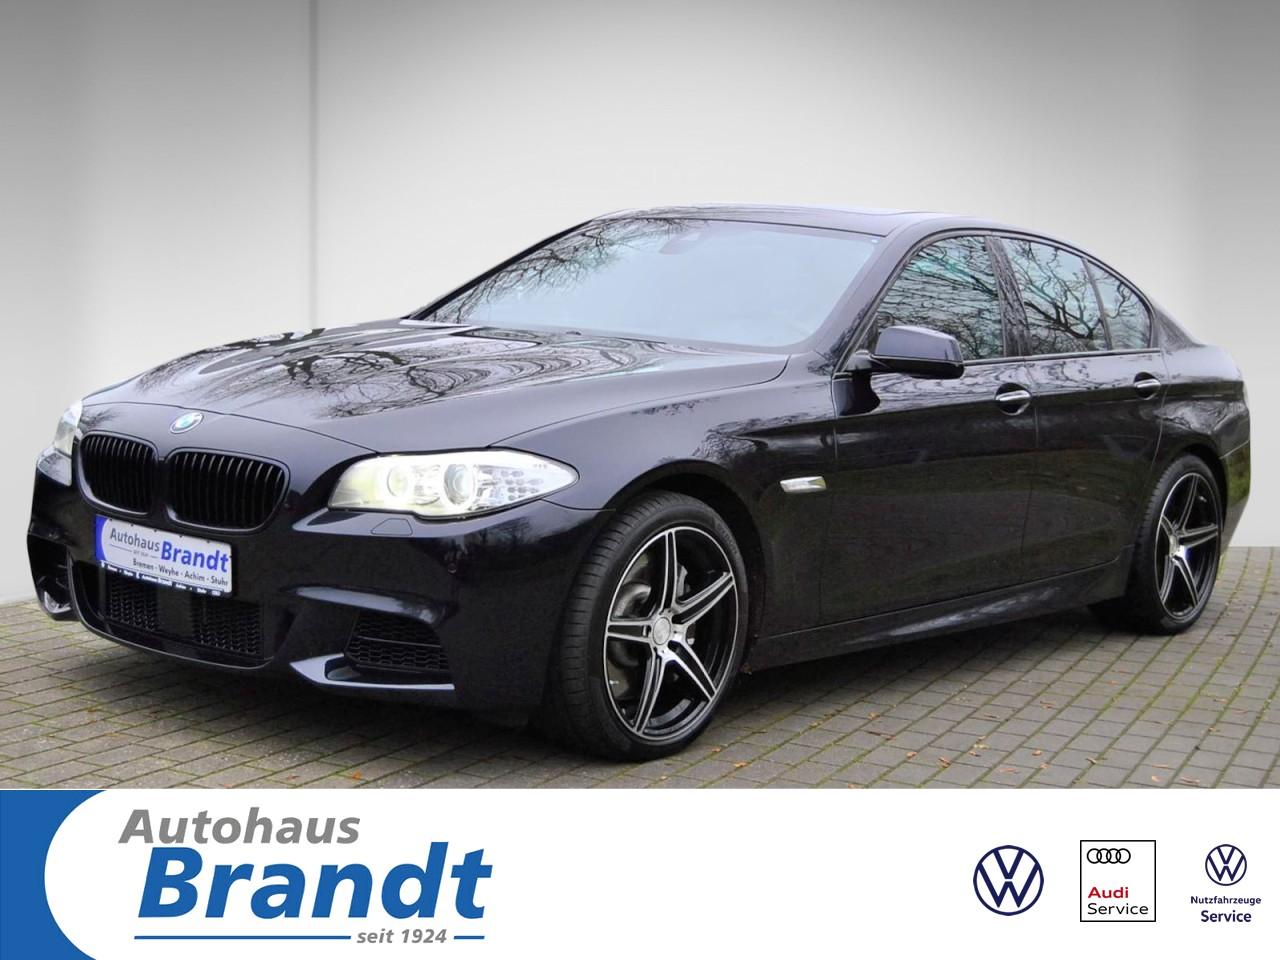 BMW M550d xDrive XENON*LEDER*SHD*HUD*GRA*AHK Klima, Jahr 2013, Diesel